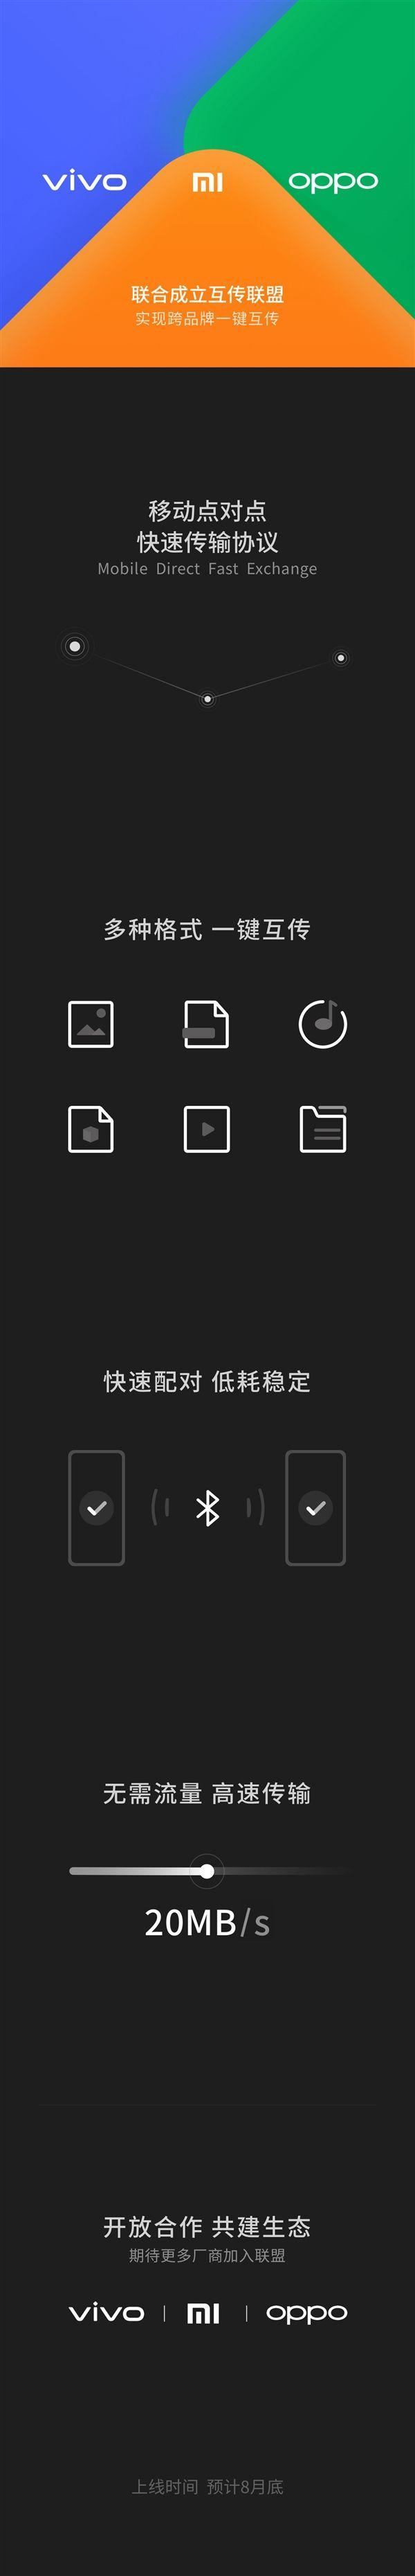 Oppo, Vivo и Xiaomi создали альянс для передачи файлов между смартфонами